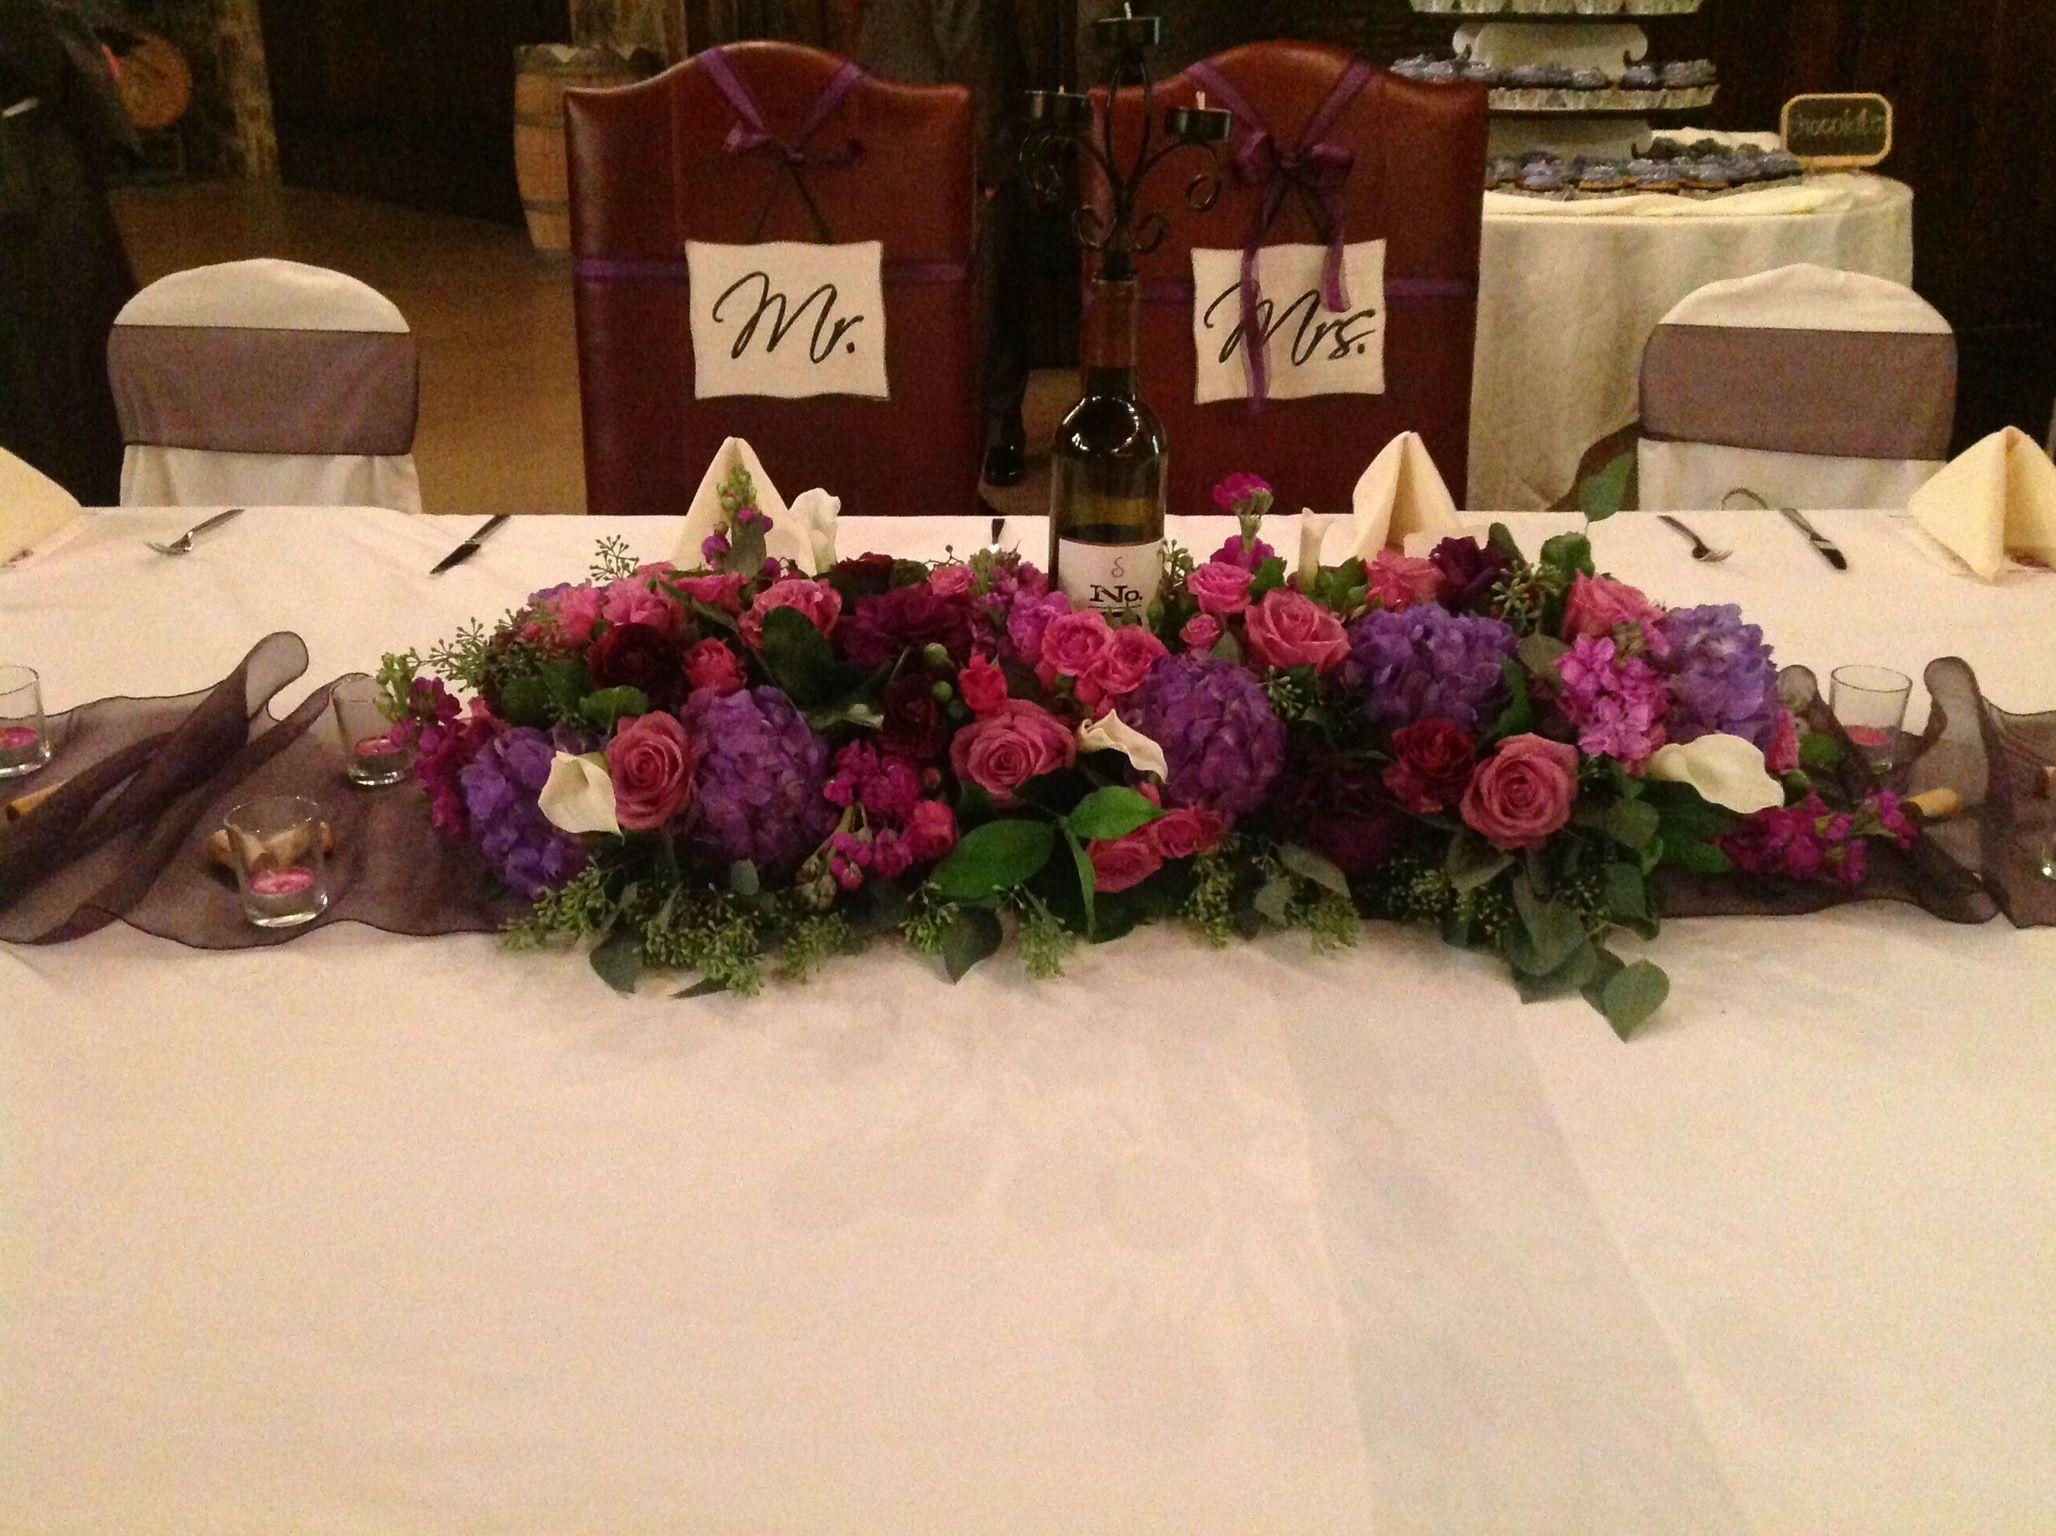 Pinterest Winter Wedding Centerpieces: Winter Wedding Swiftwater Cellars